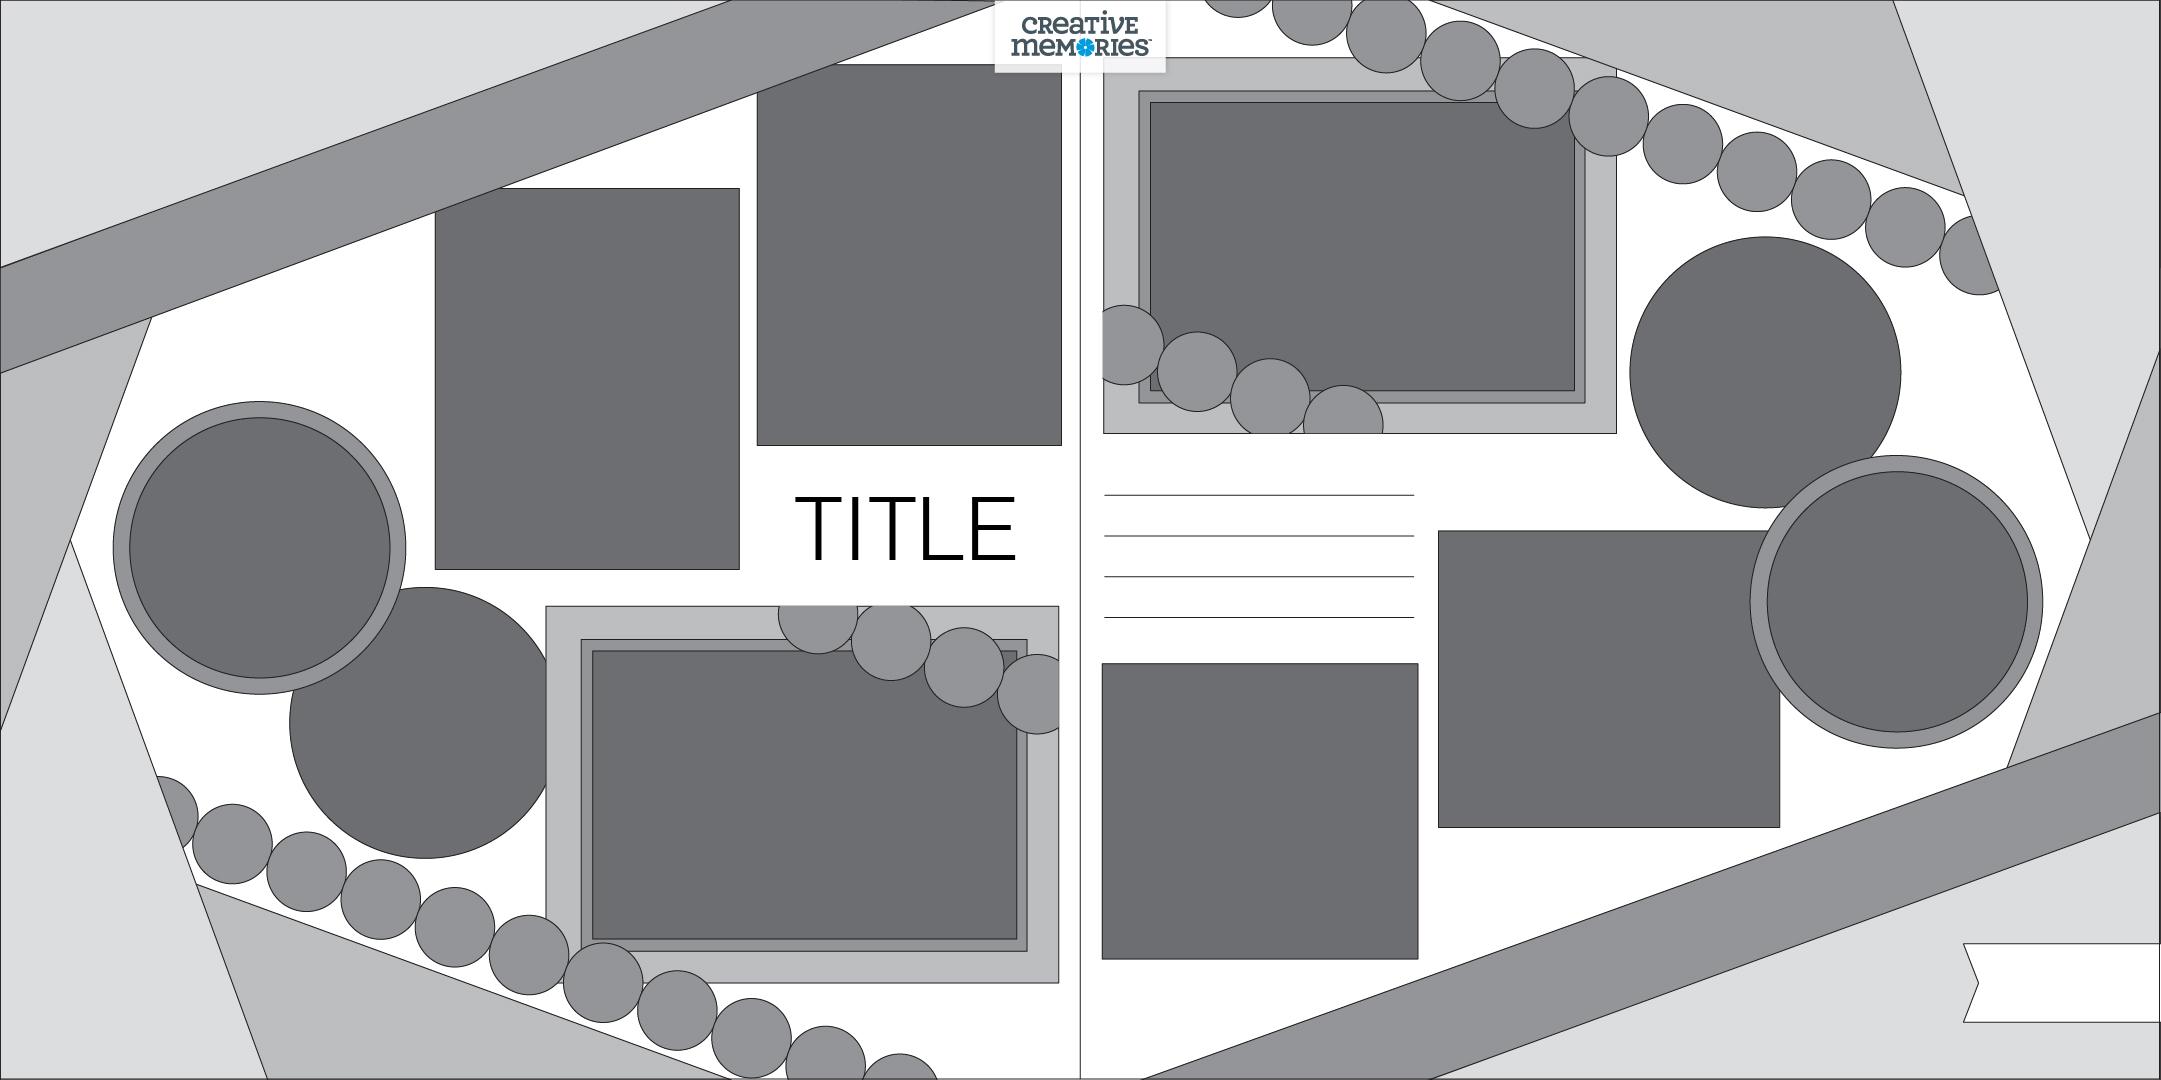 Worldwide-Virtual-Crop-Challenge8-Sketch-Creative-Memories